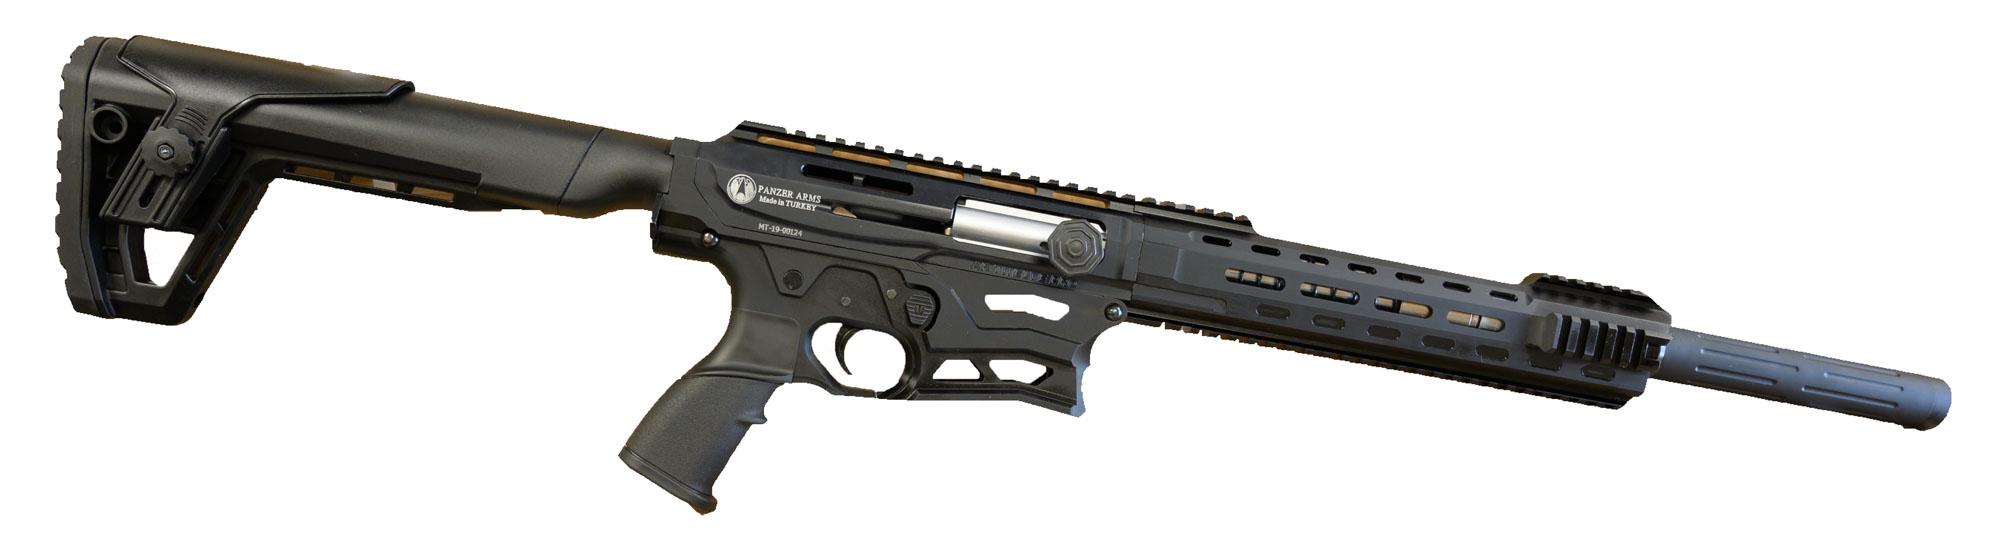 Panzer Arms AR-12 PRO Shotgun AR Twelve PRO 12ga · DK Firearms